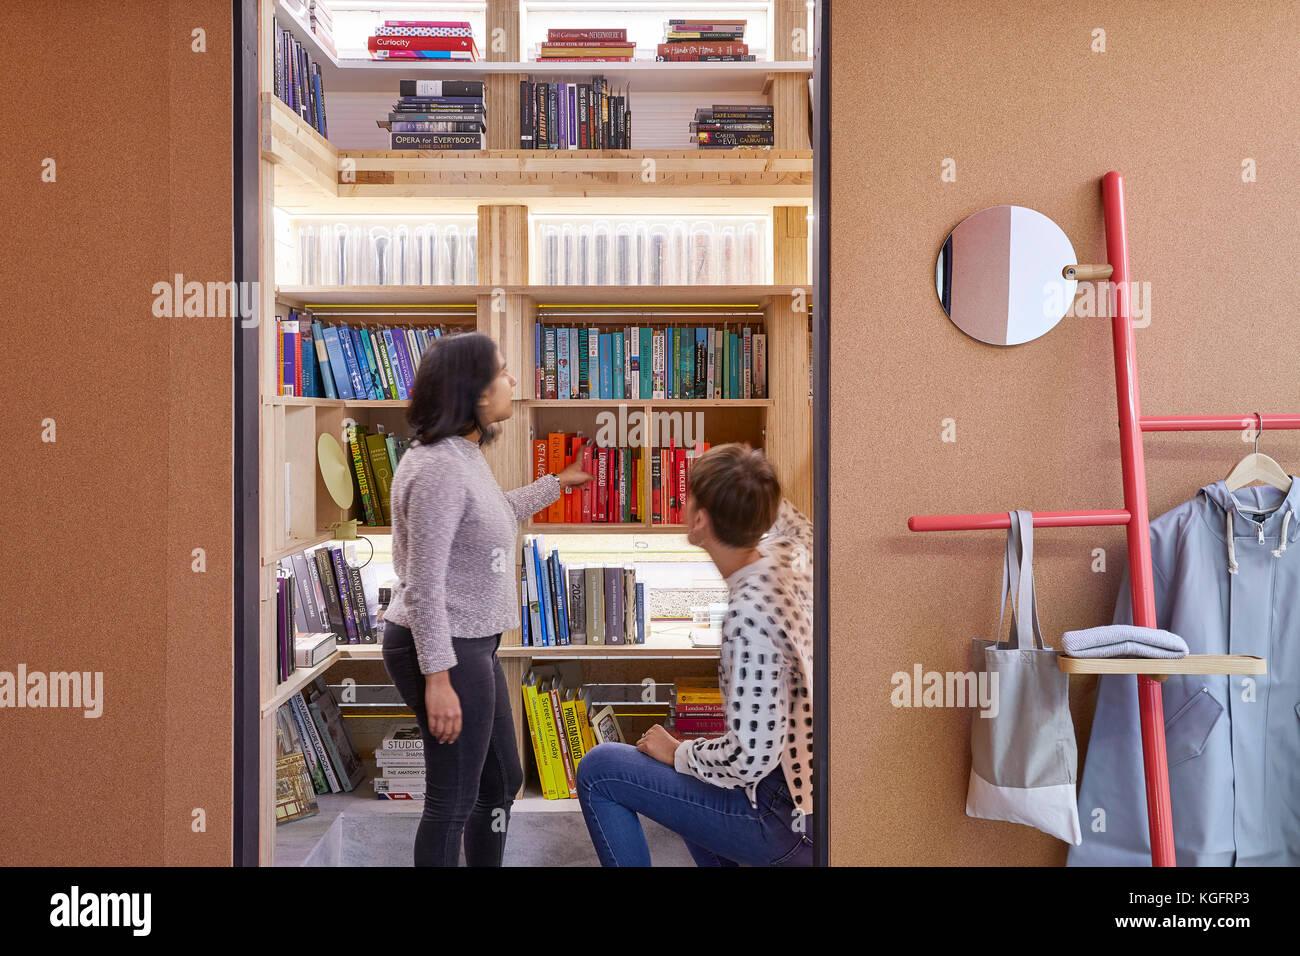 Lala. Der Stack - mini Living urban Kabine, London, Großbritannien Architekt: sam Jacob Studio, 2017. Stockbild